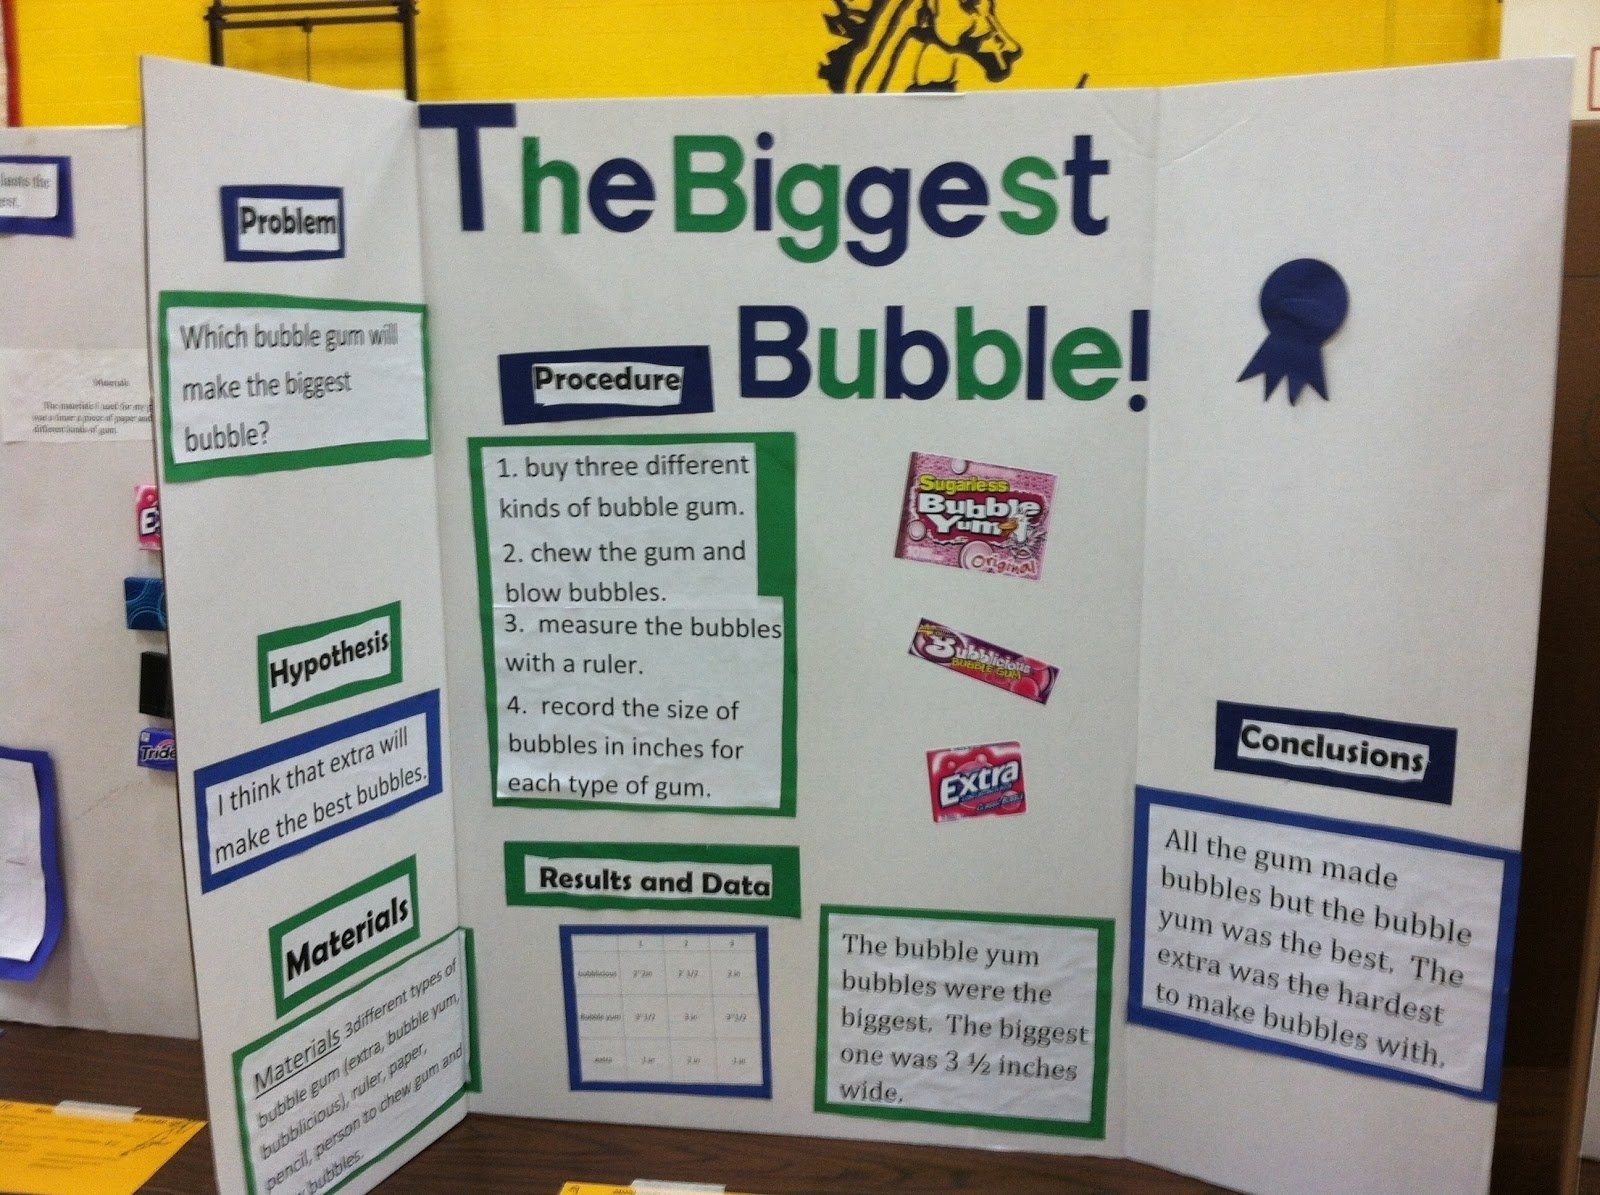 10 Beautiful Fifth Grade Science Project Ideas easy 7th grade science fair projects coursework help 23 2021